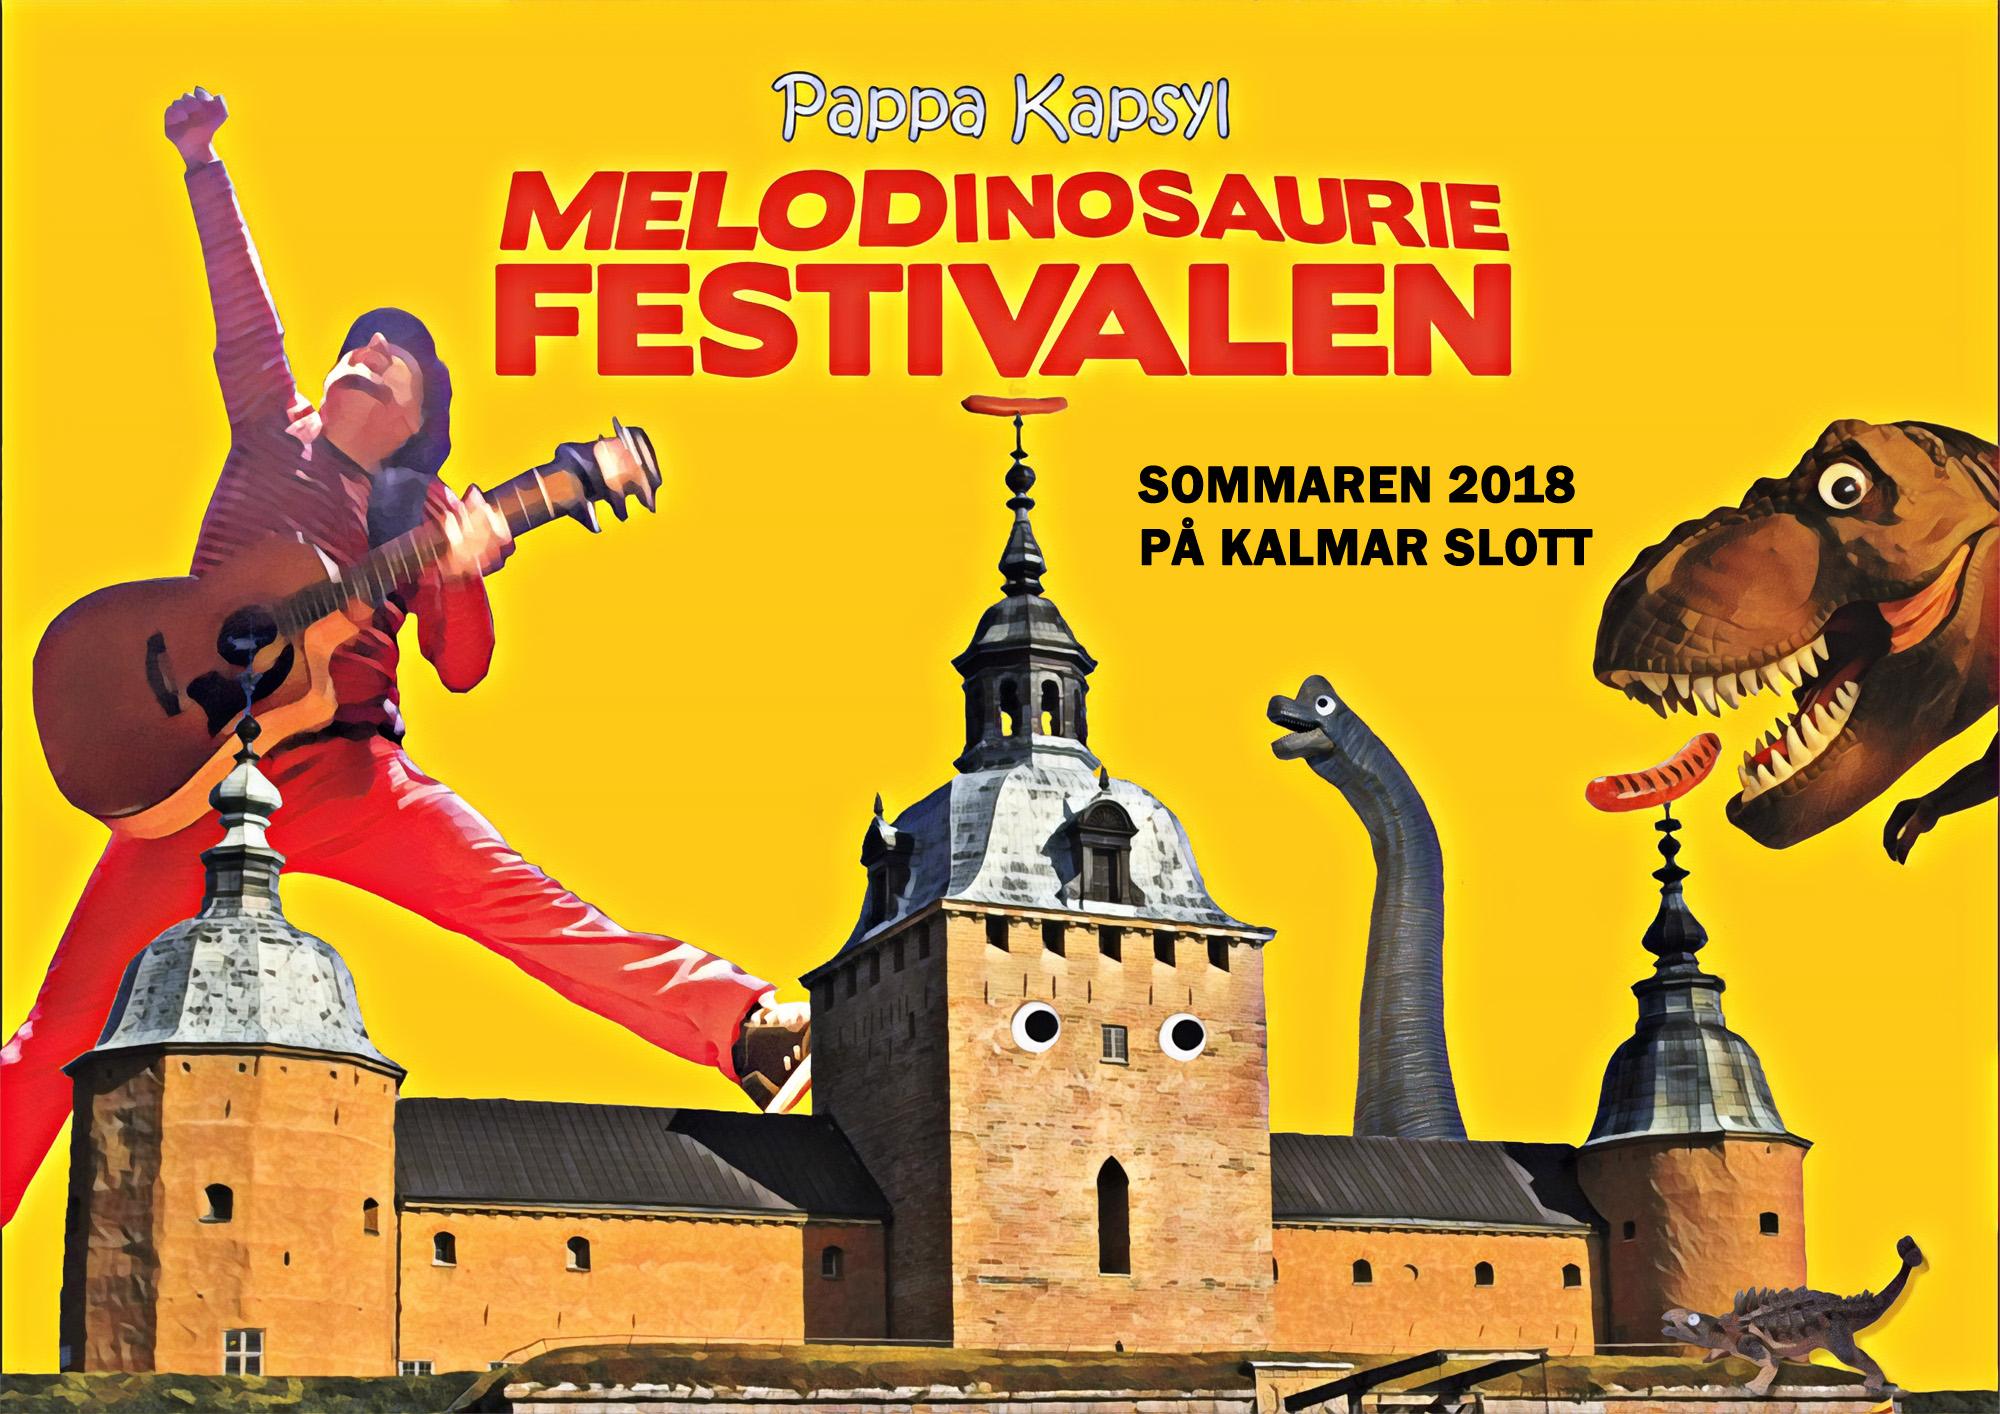 Melodinosauriefestivalen_Pappa_Kapsyl_2018_Kalmar_Slott_liggande